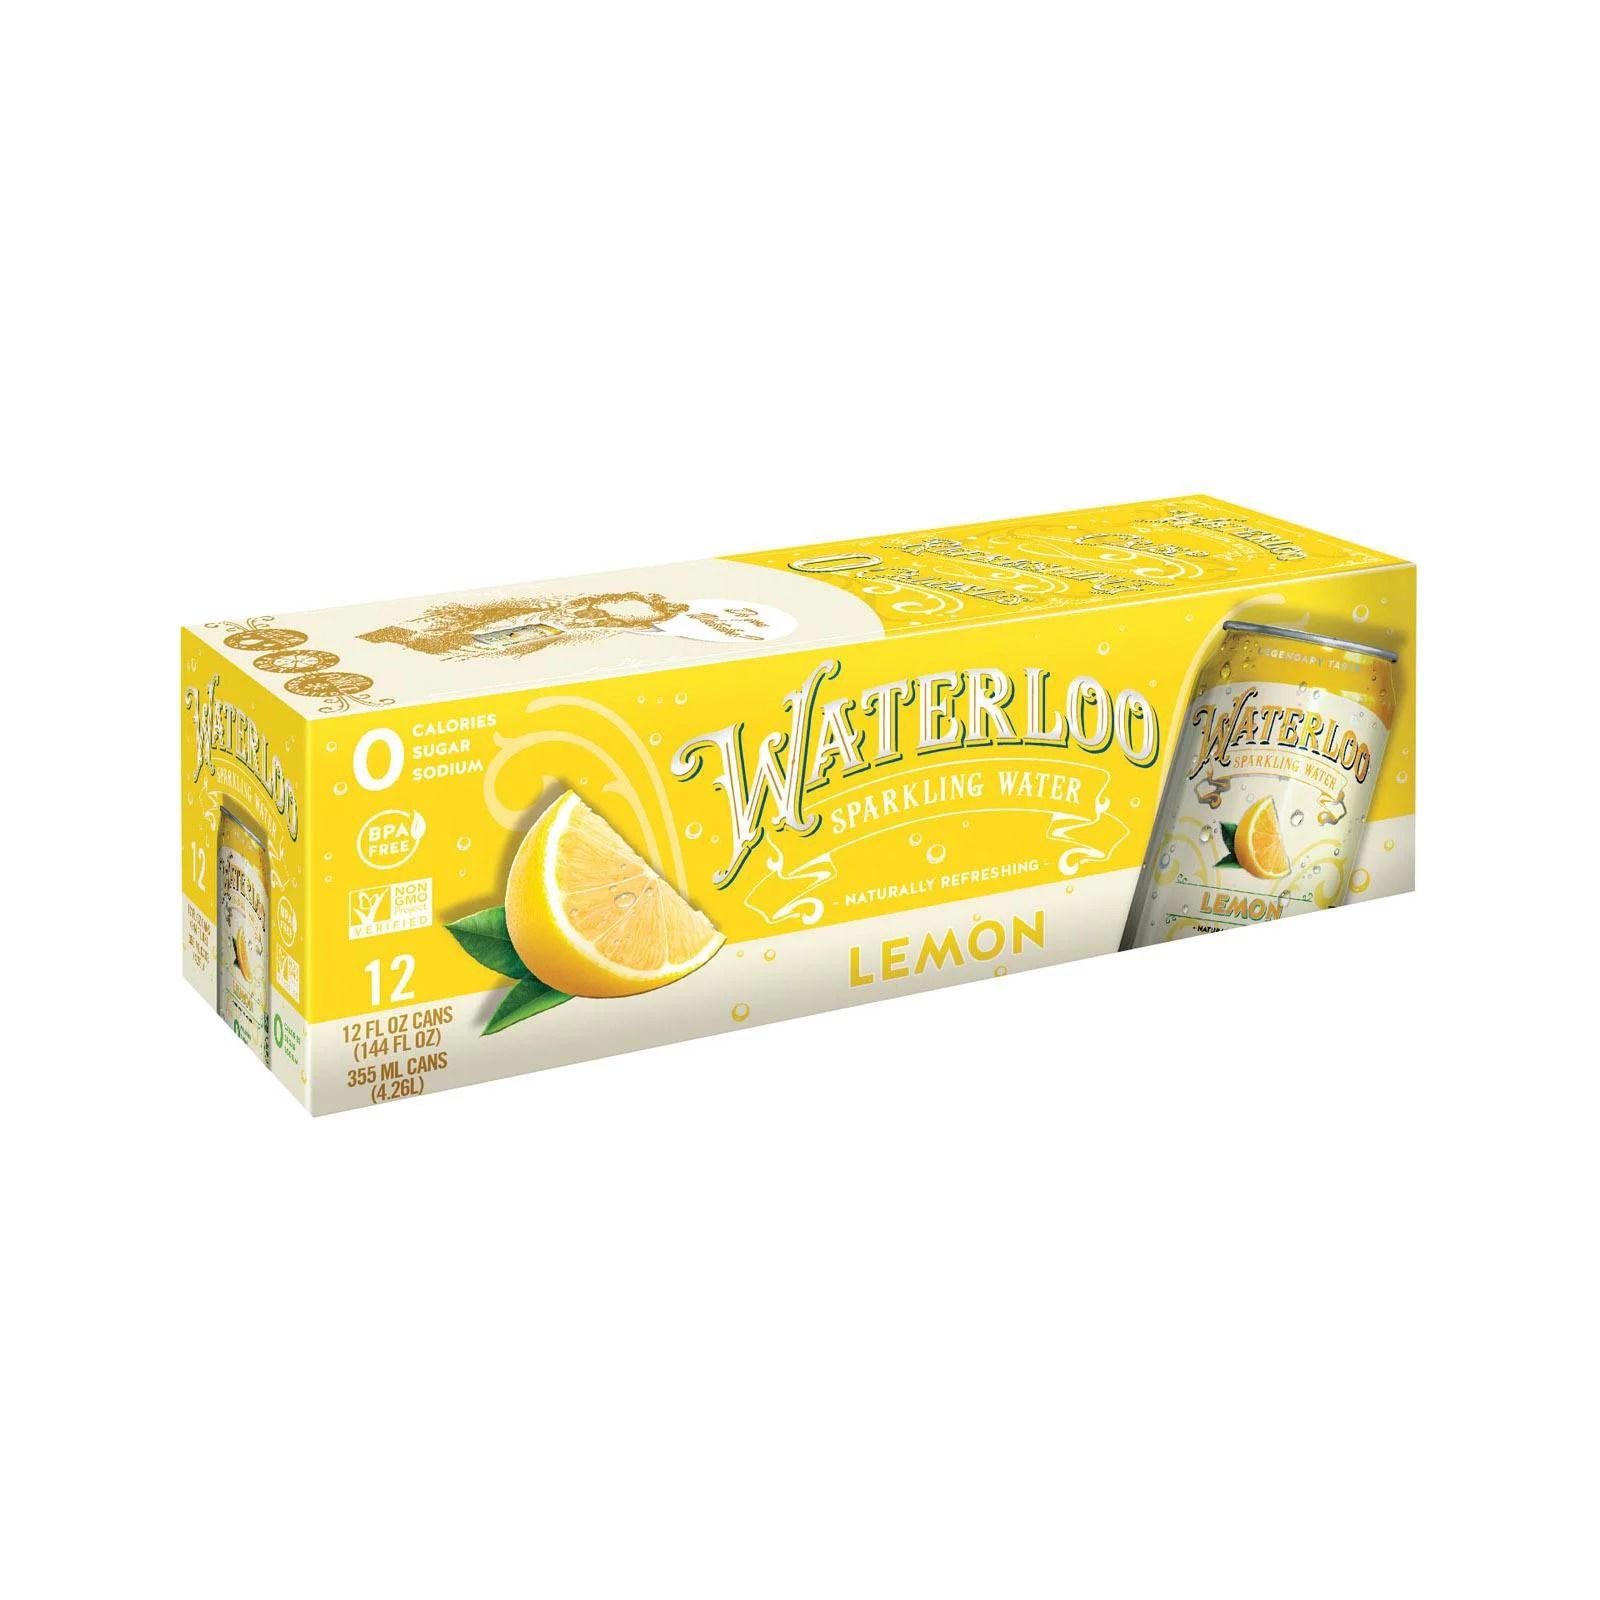 Waterloo Sparkling Water Lemon Case Of 1 12 12 Fl Oz